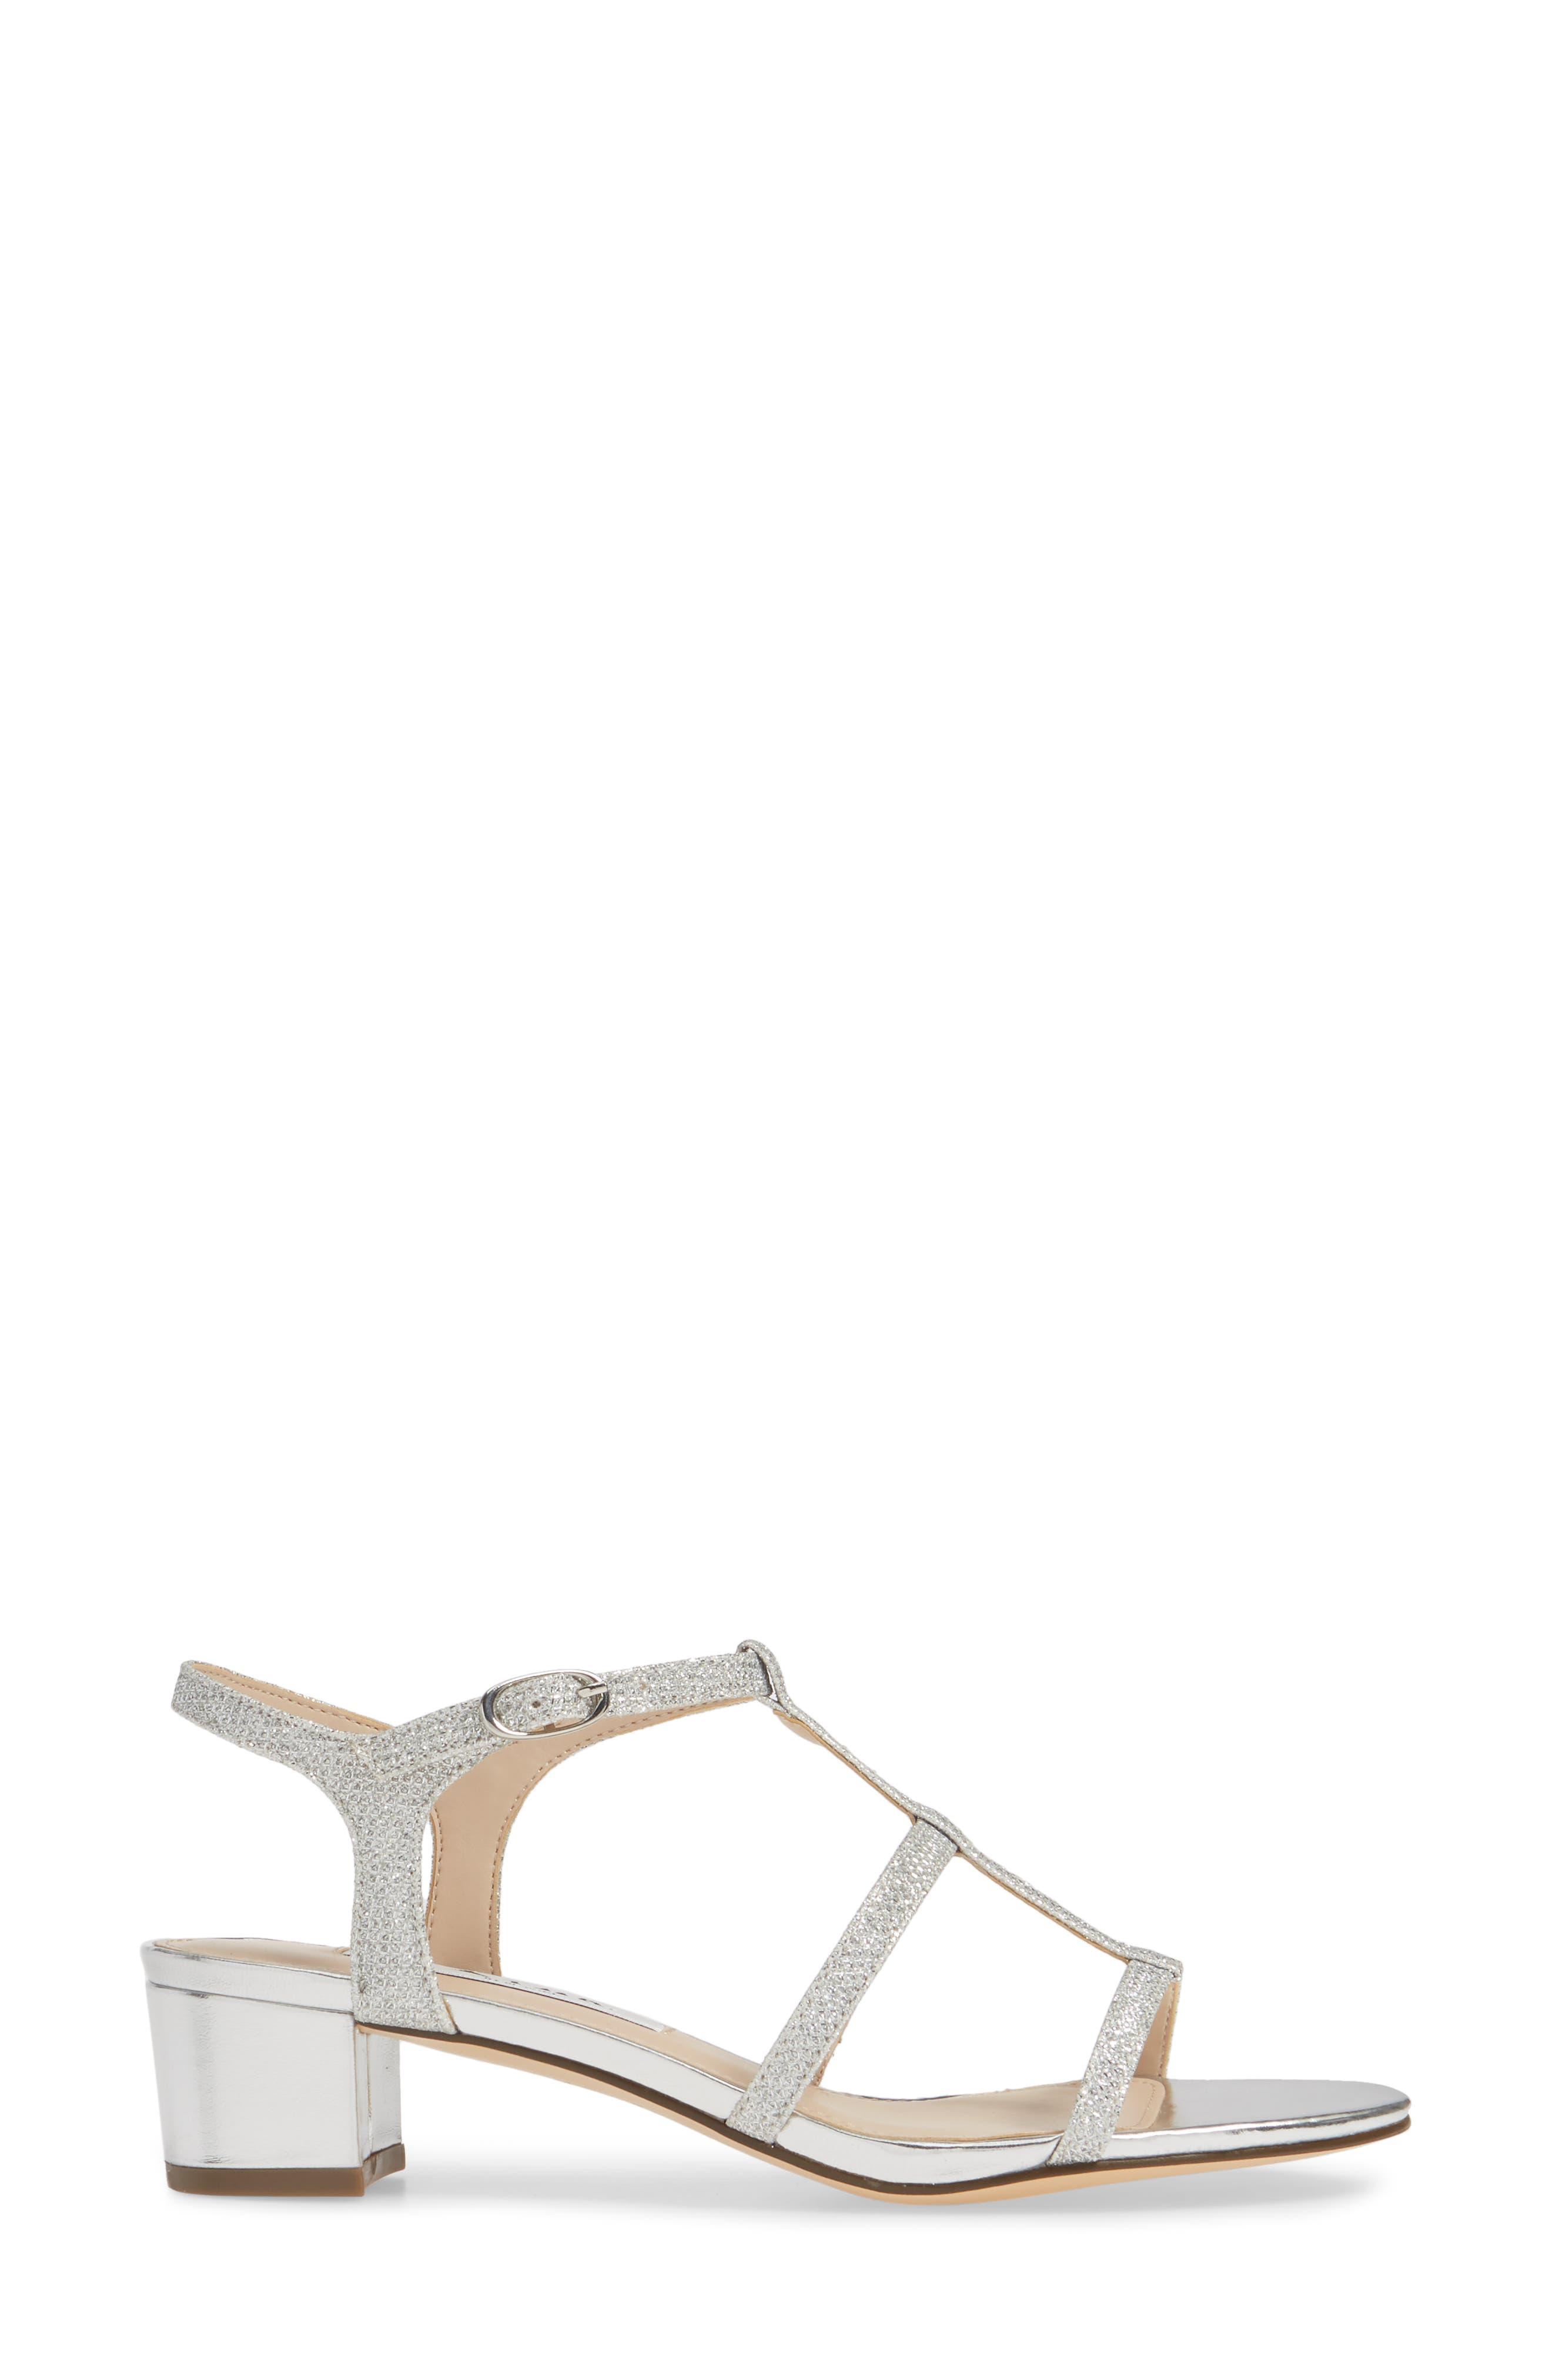 NINA, Gelisa T-Strap Sandal, Alternate thumbnail 3, color, SILVER FABRIC